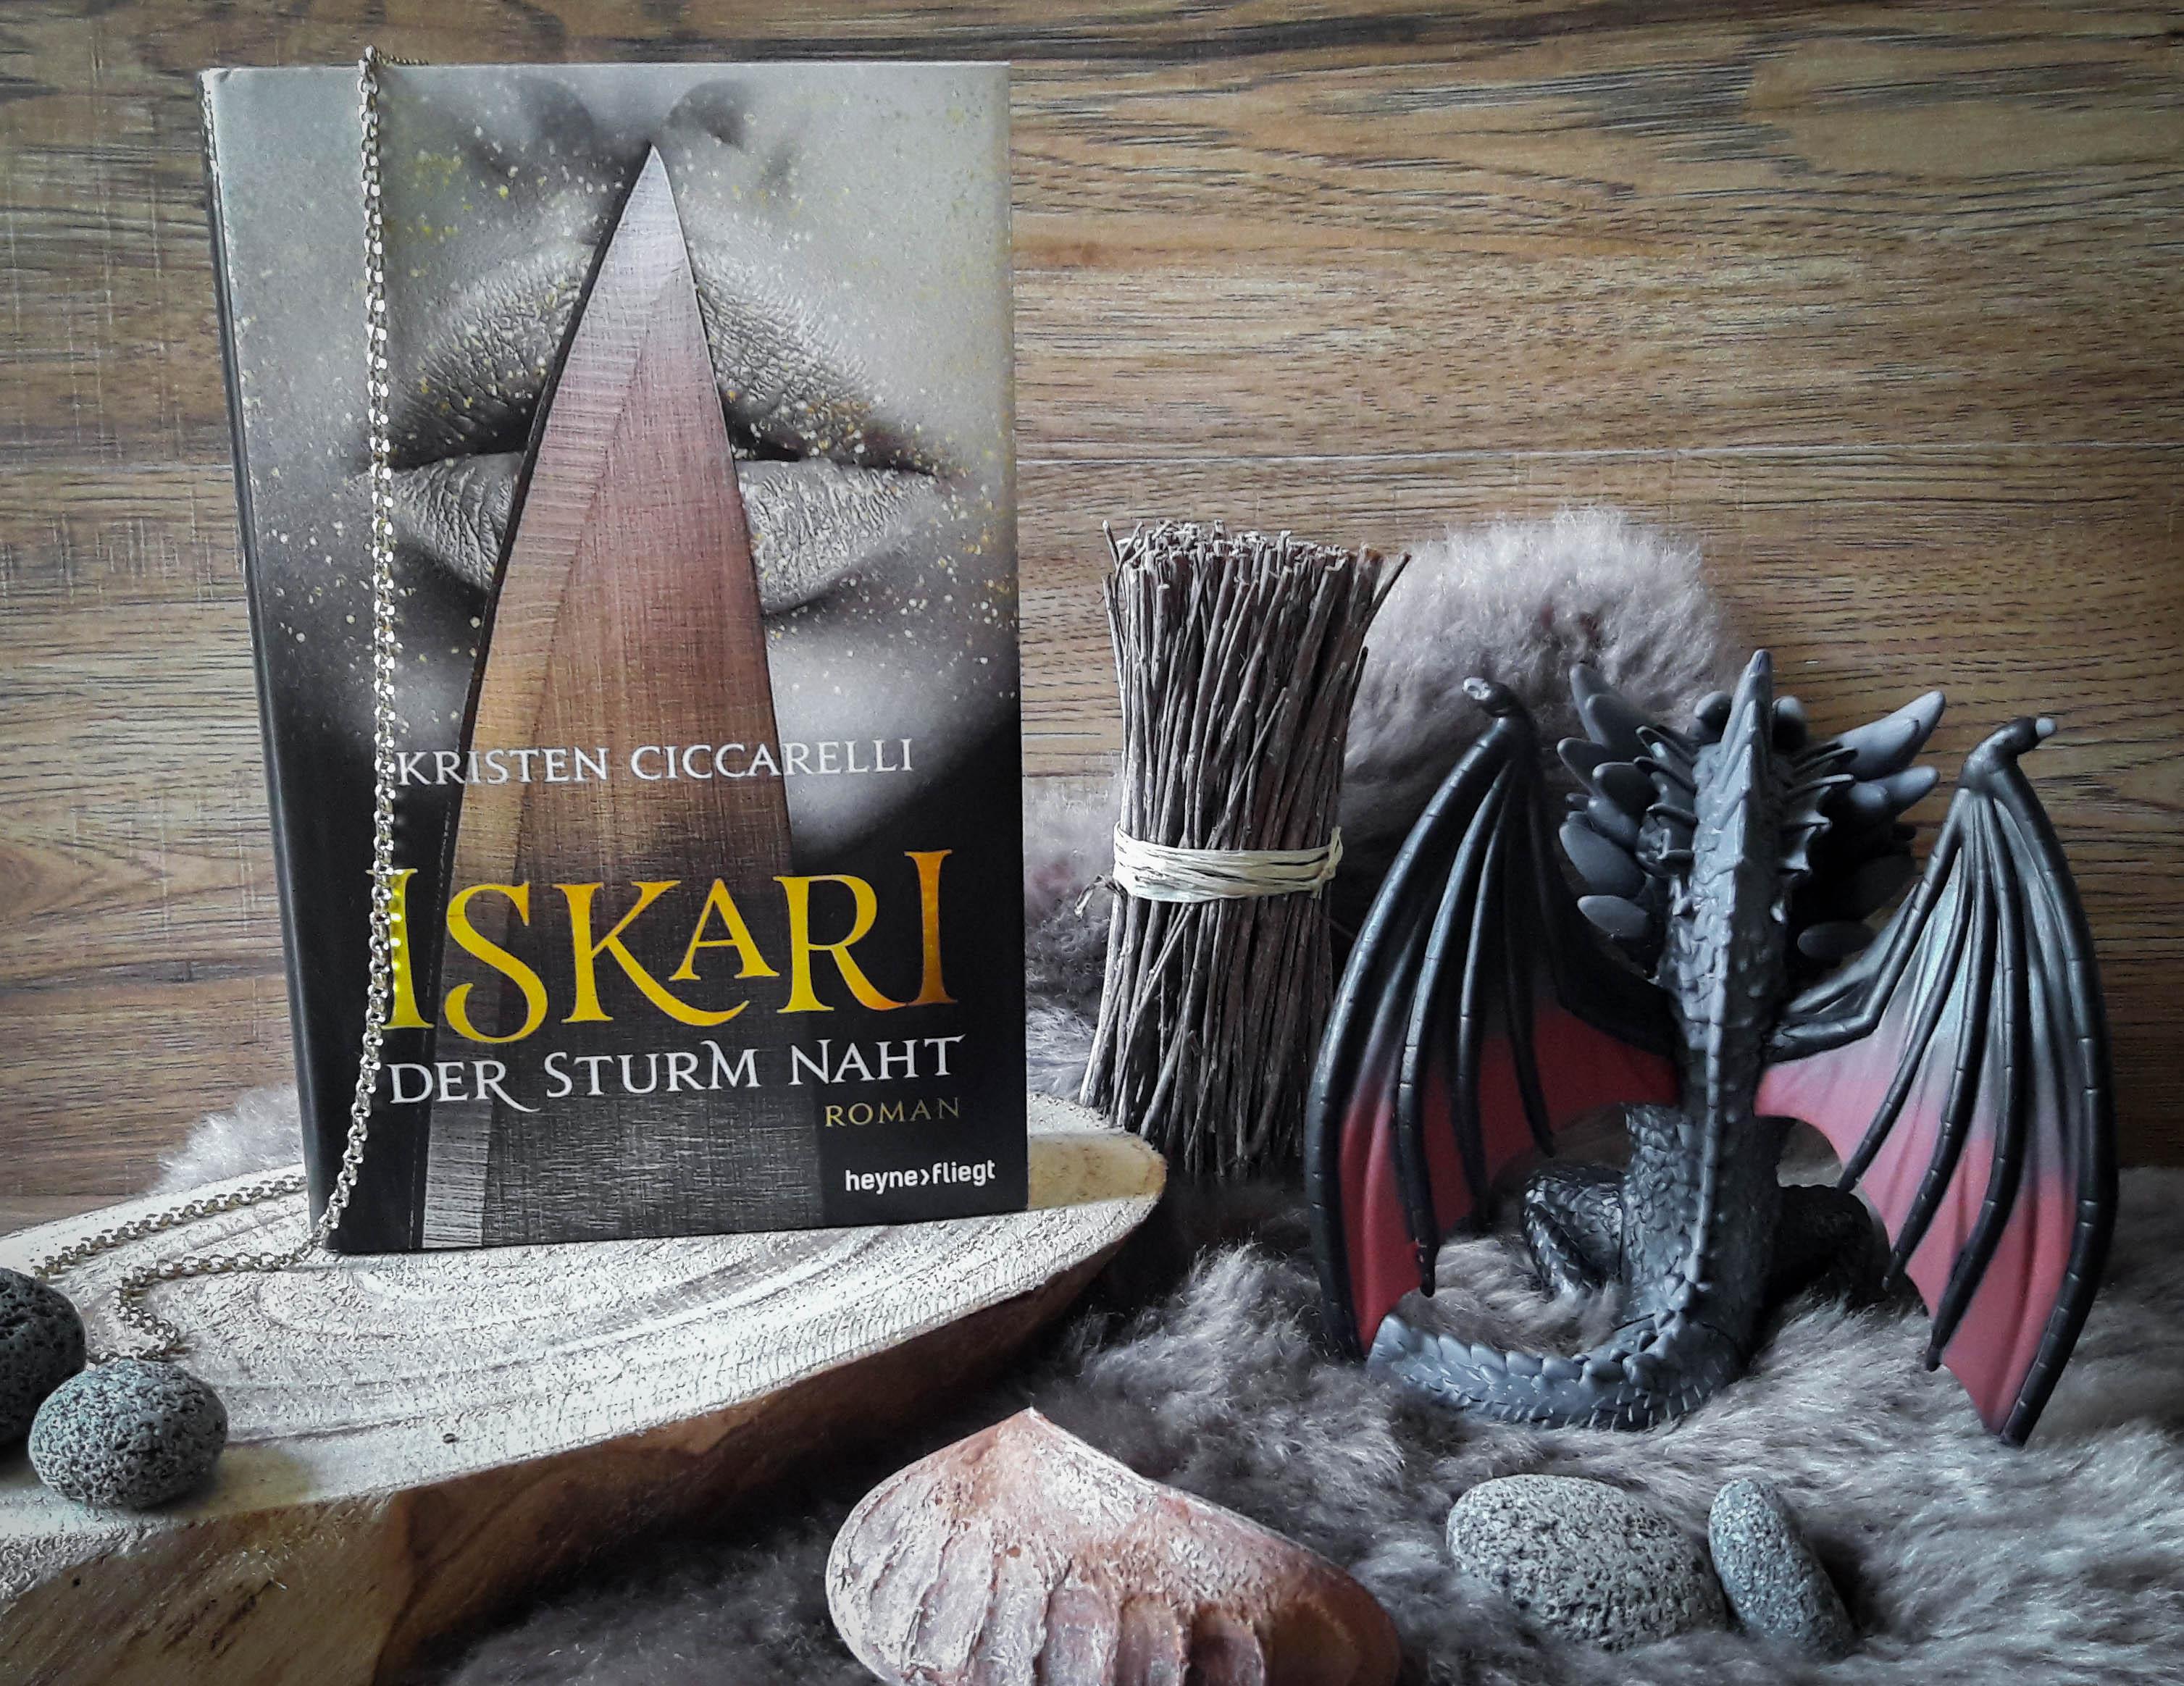 Iskari, Der Sturm naht – Kristen Ciccarelli graphic